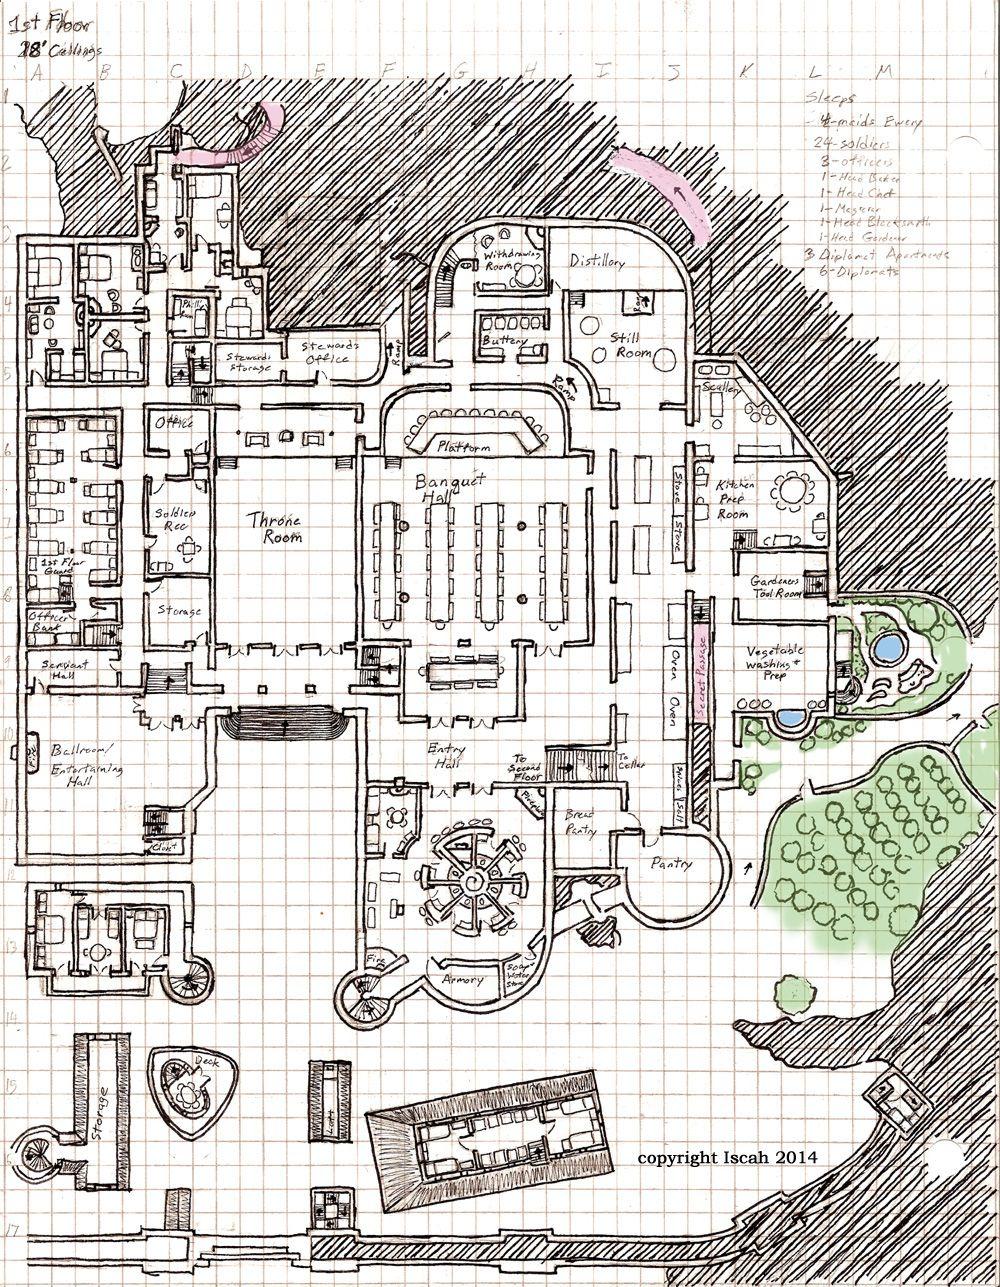 castle grounds layout - Google Search | World-Building | Pinterest ...